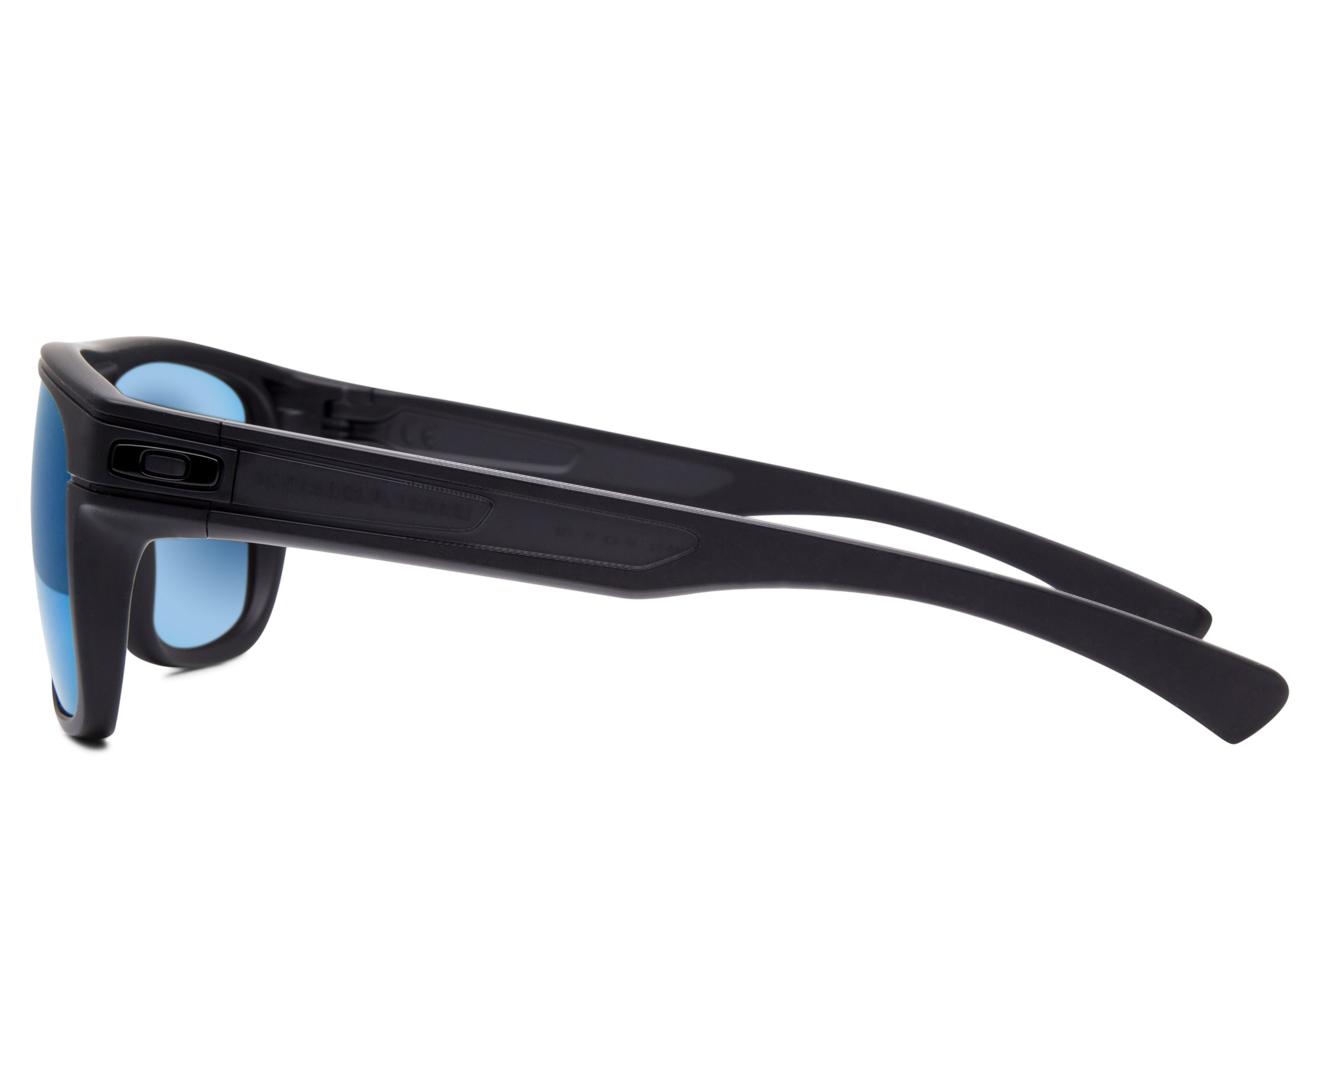 ef7b75953f Oakley Breadbox Sunglasses - Matte Black Ink Violet Iridium